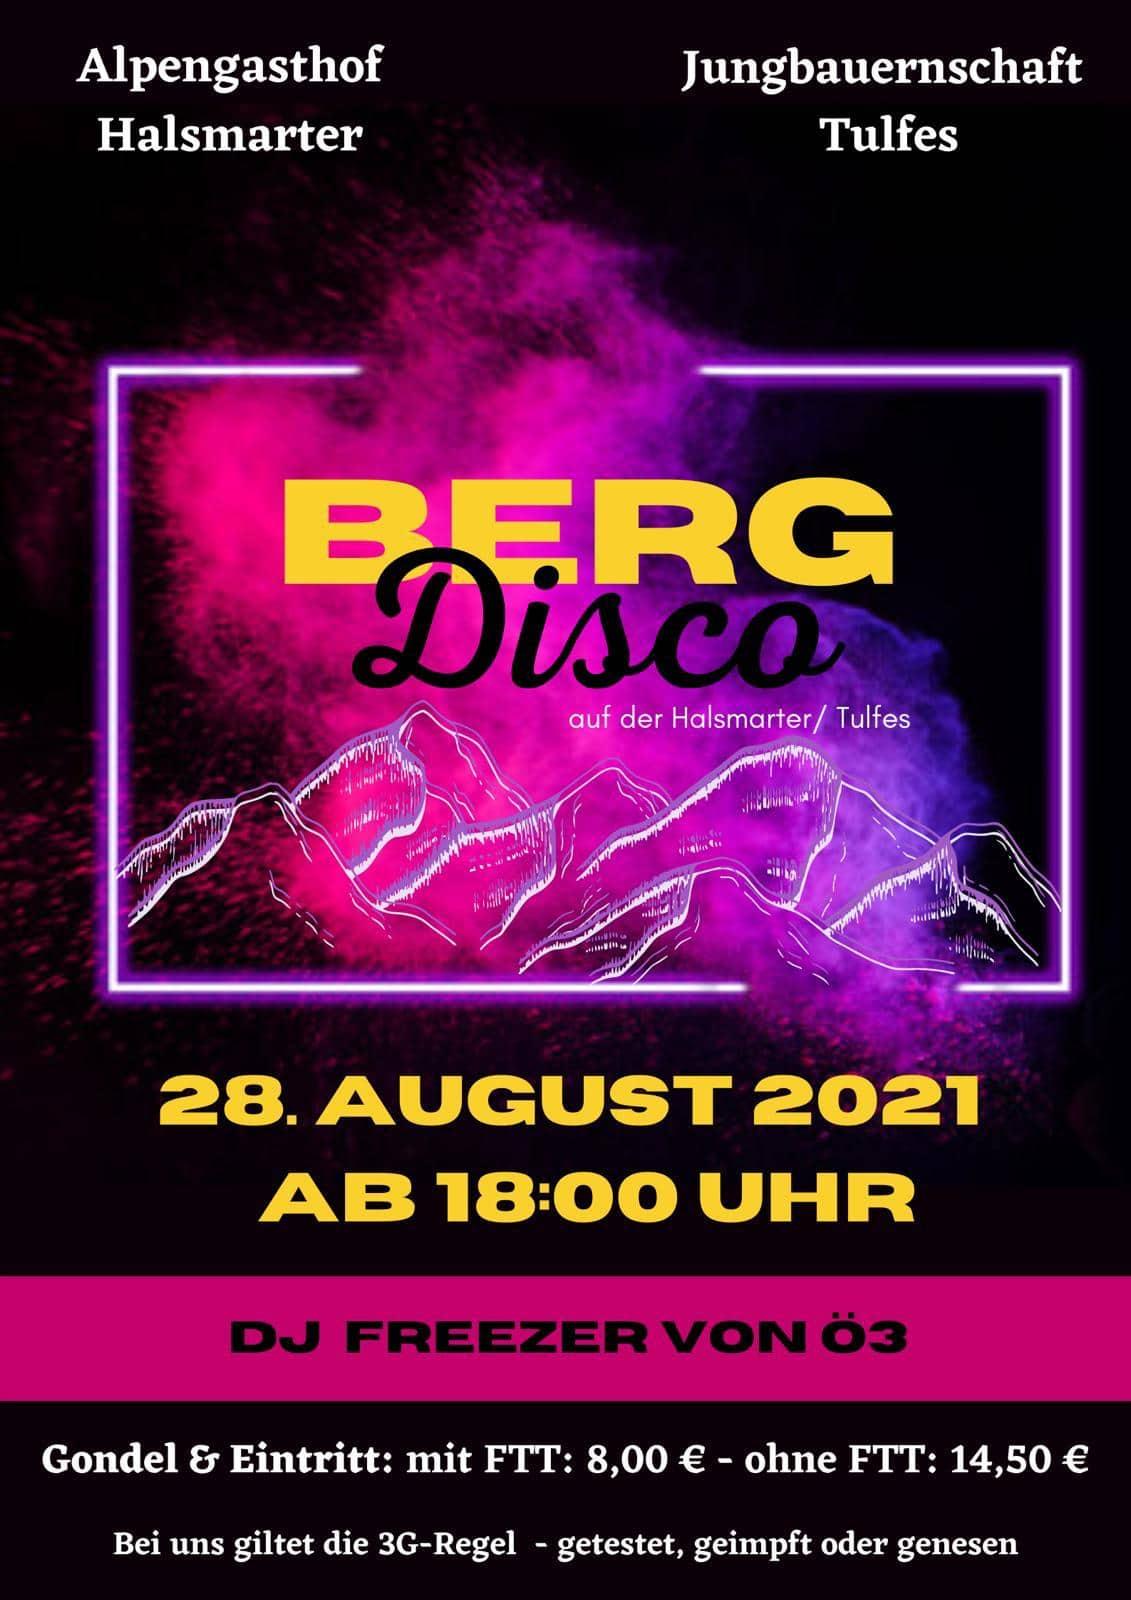 Bergdisco mit DJ FREEZER von Ö3